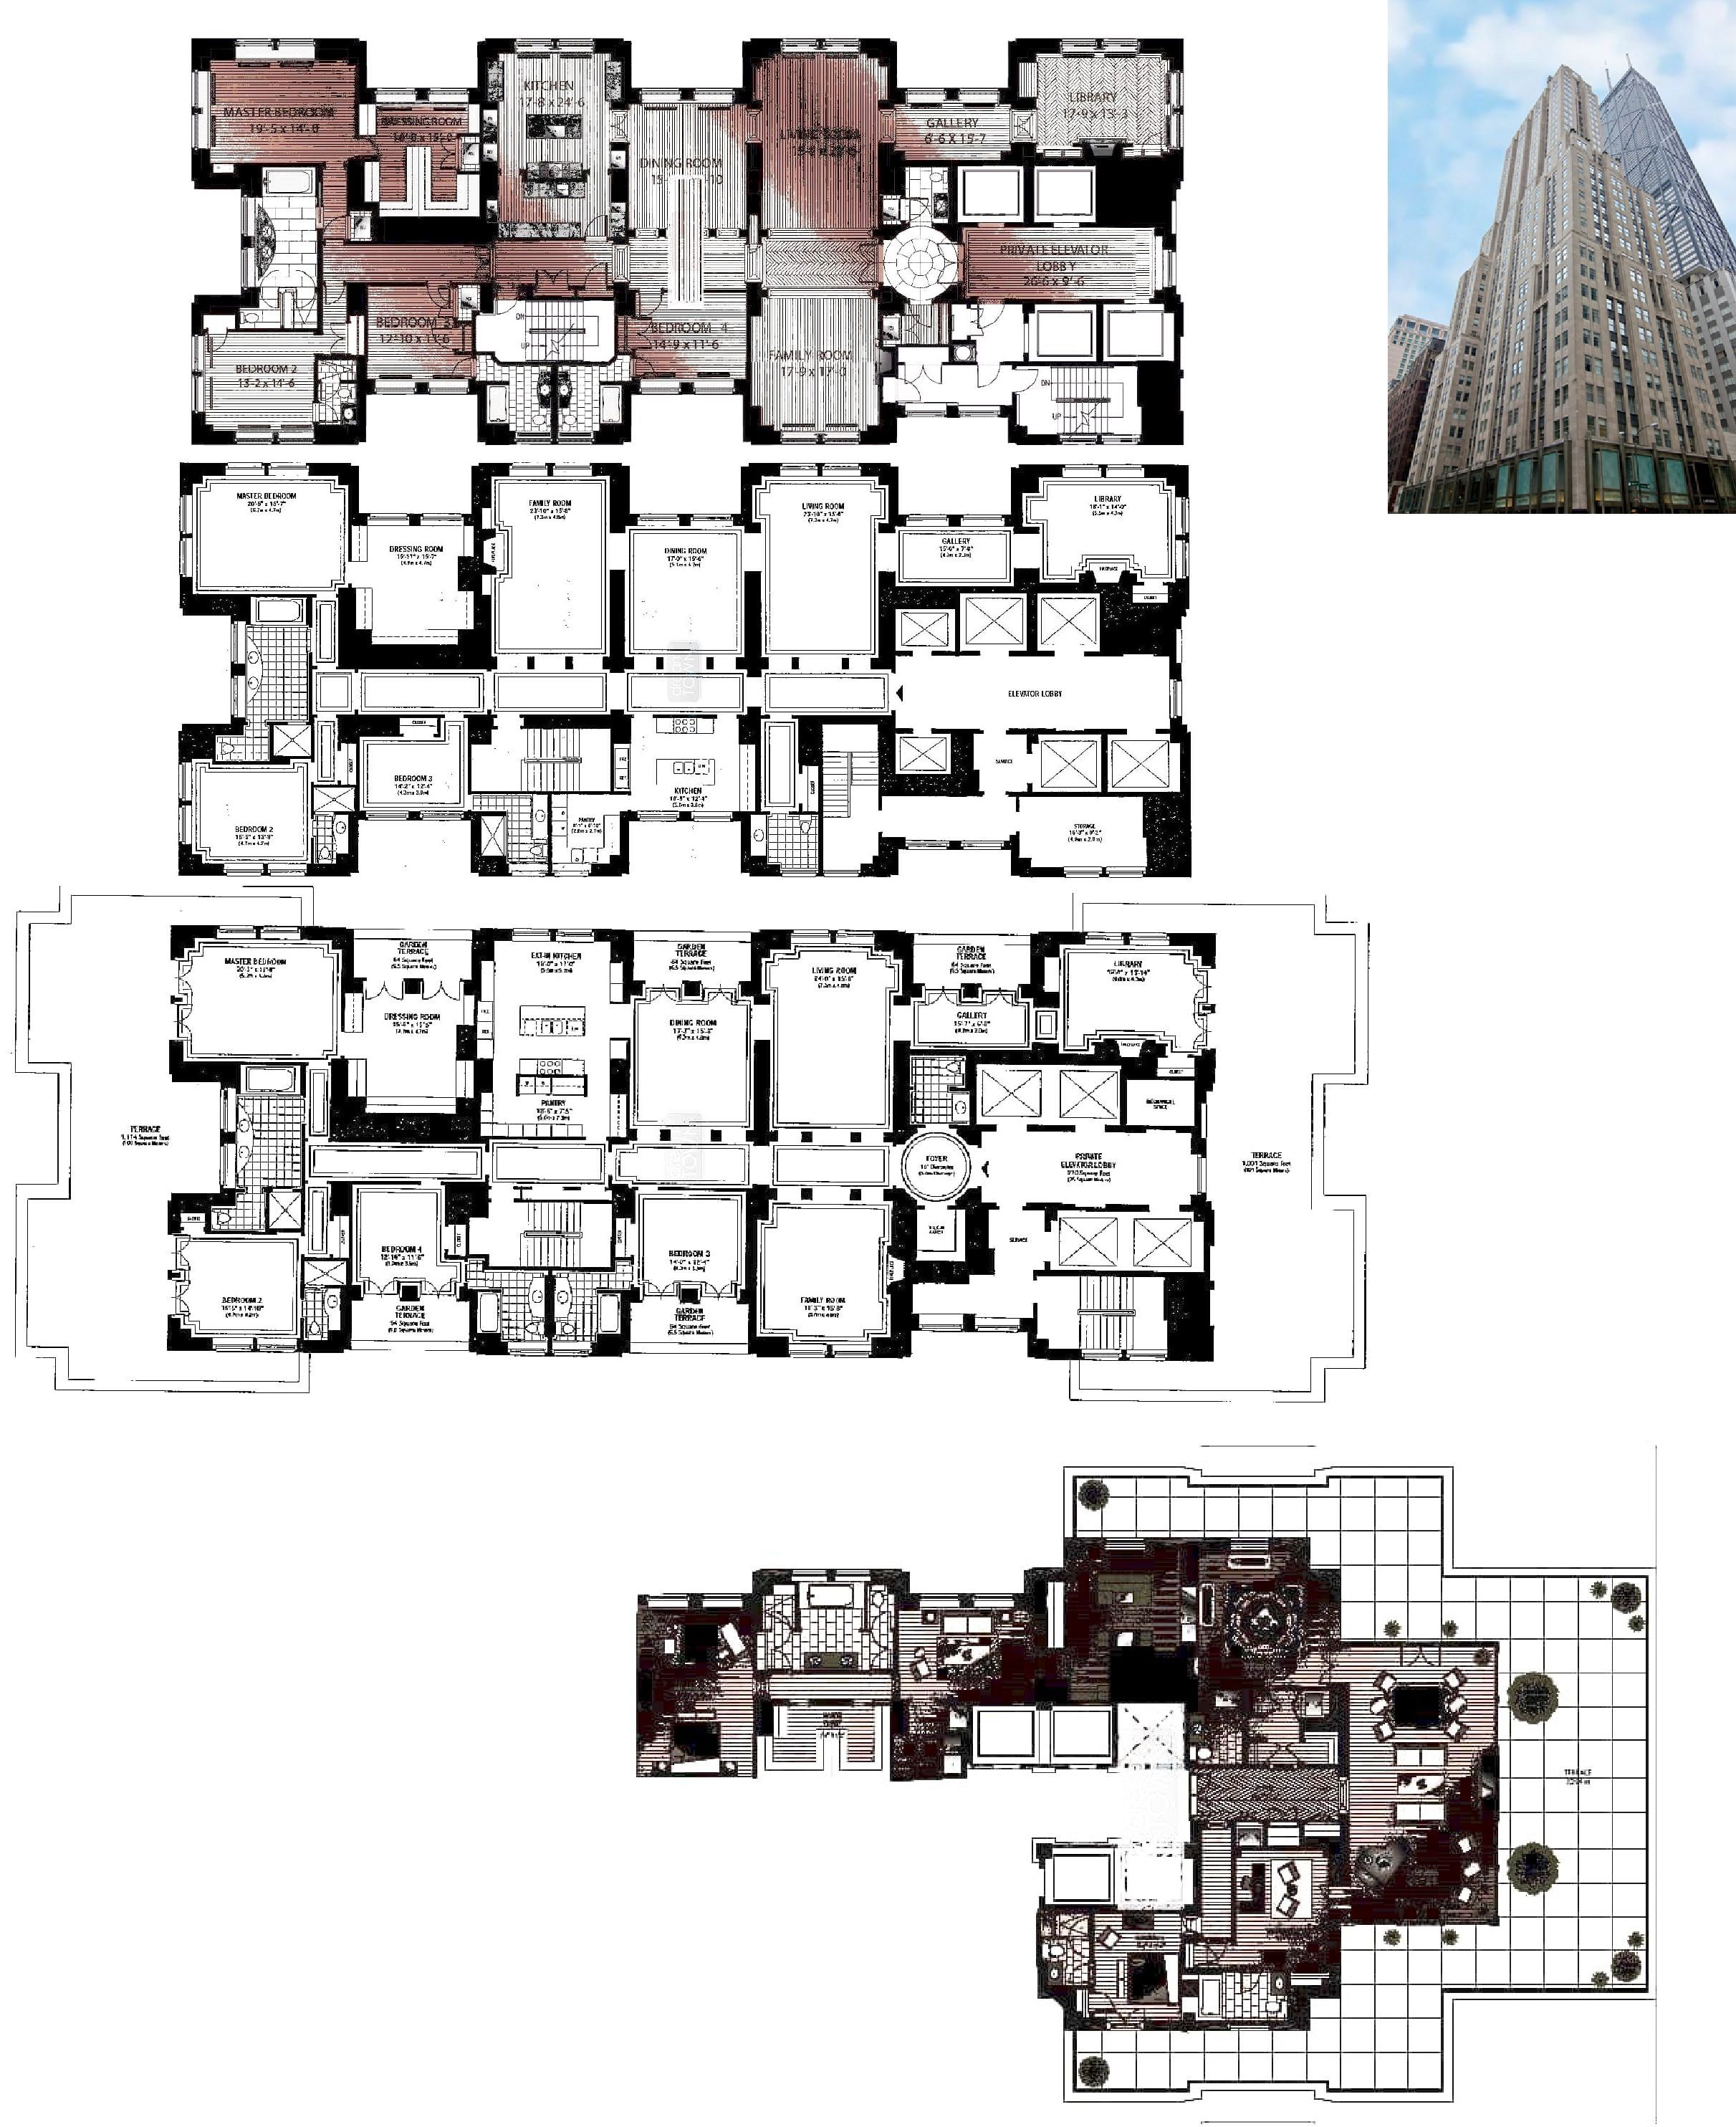 159 E Walton Chicago Floorplan Floor Plans City Living Apartment Chicago Condos